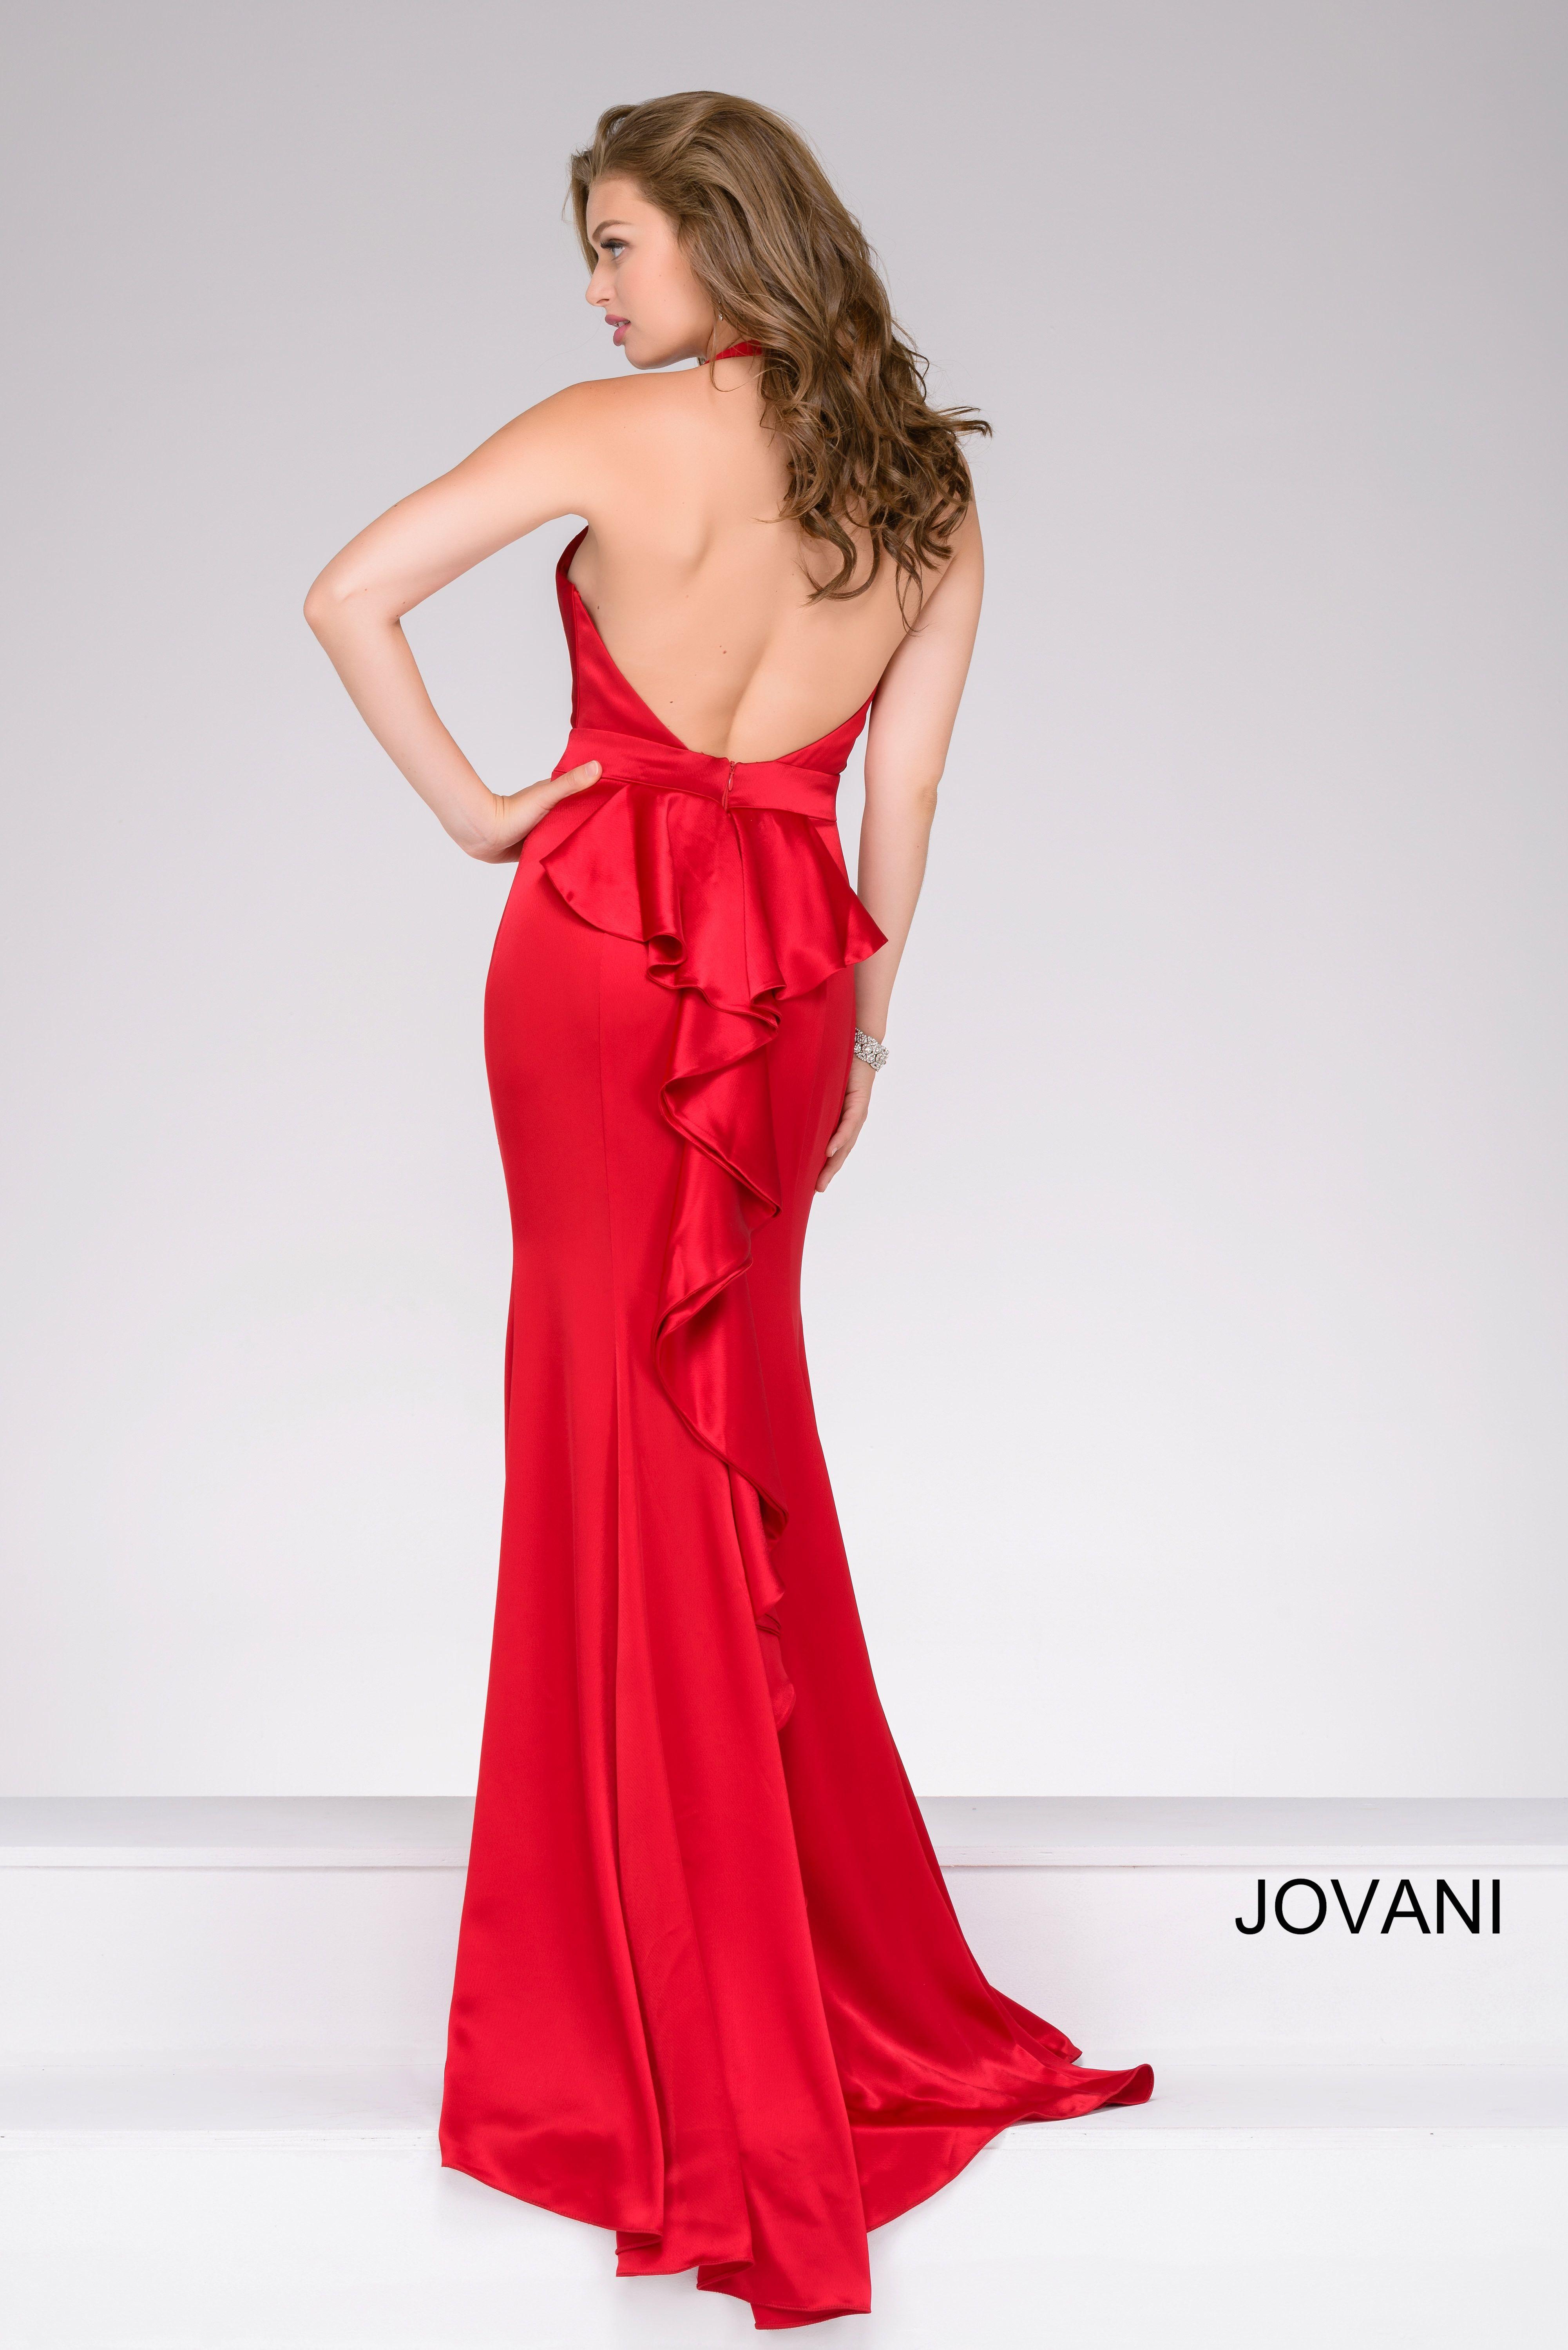 Fancy Prom Dresses Ft Worth Tx Frieze - Colorful Wedding Dress Ideas ...